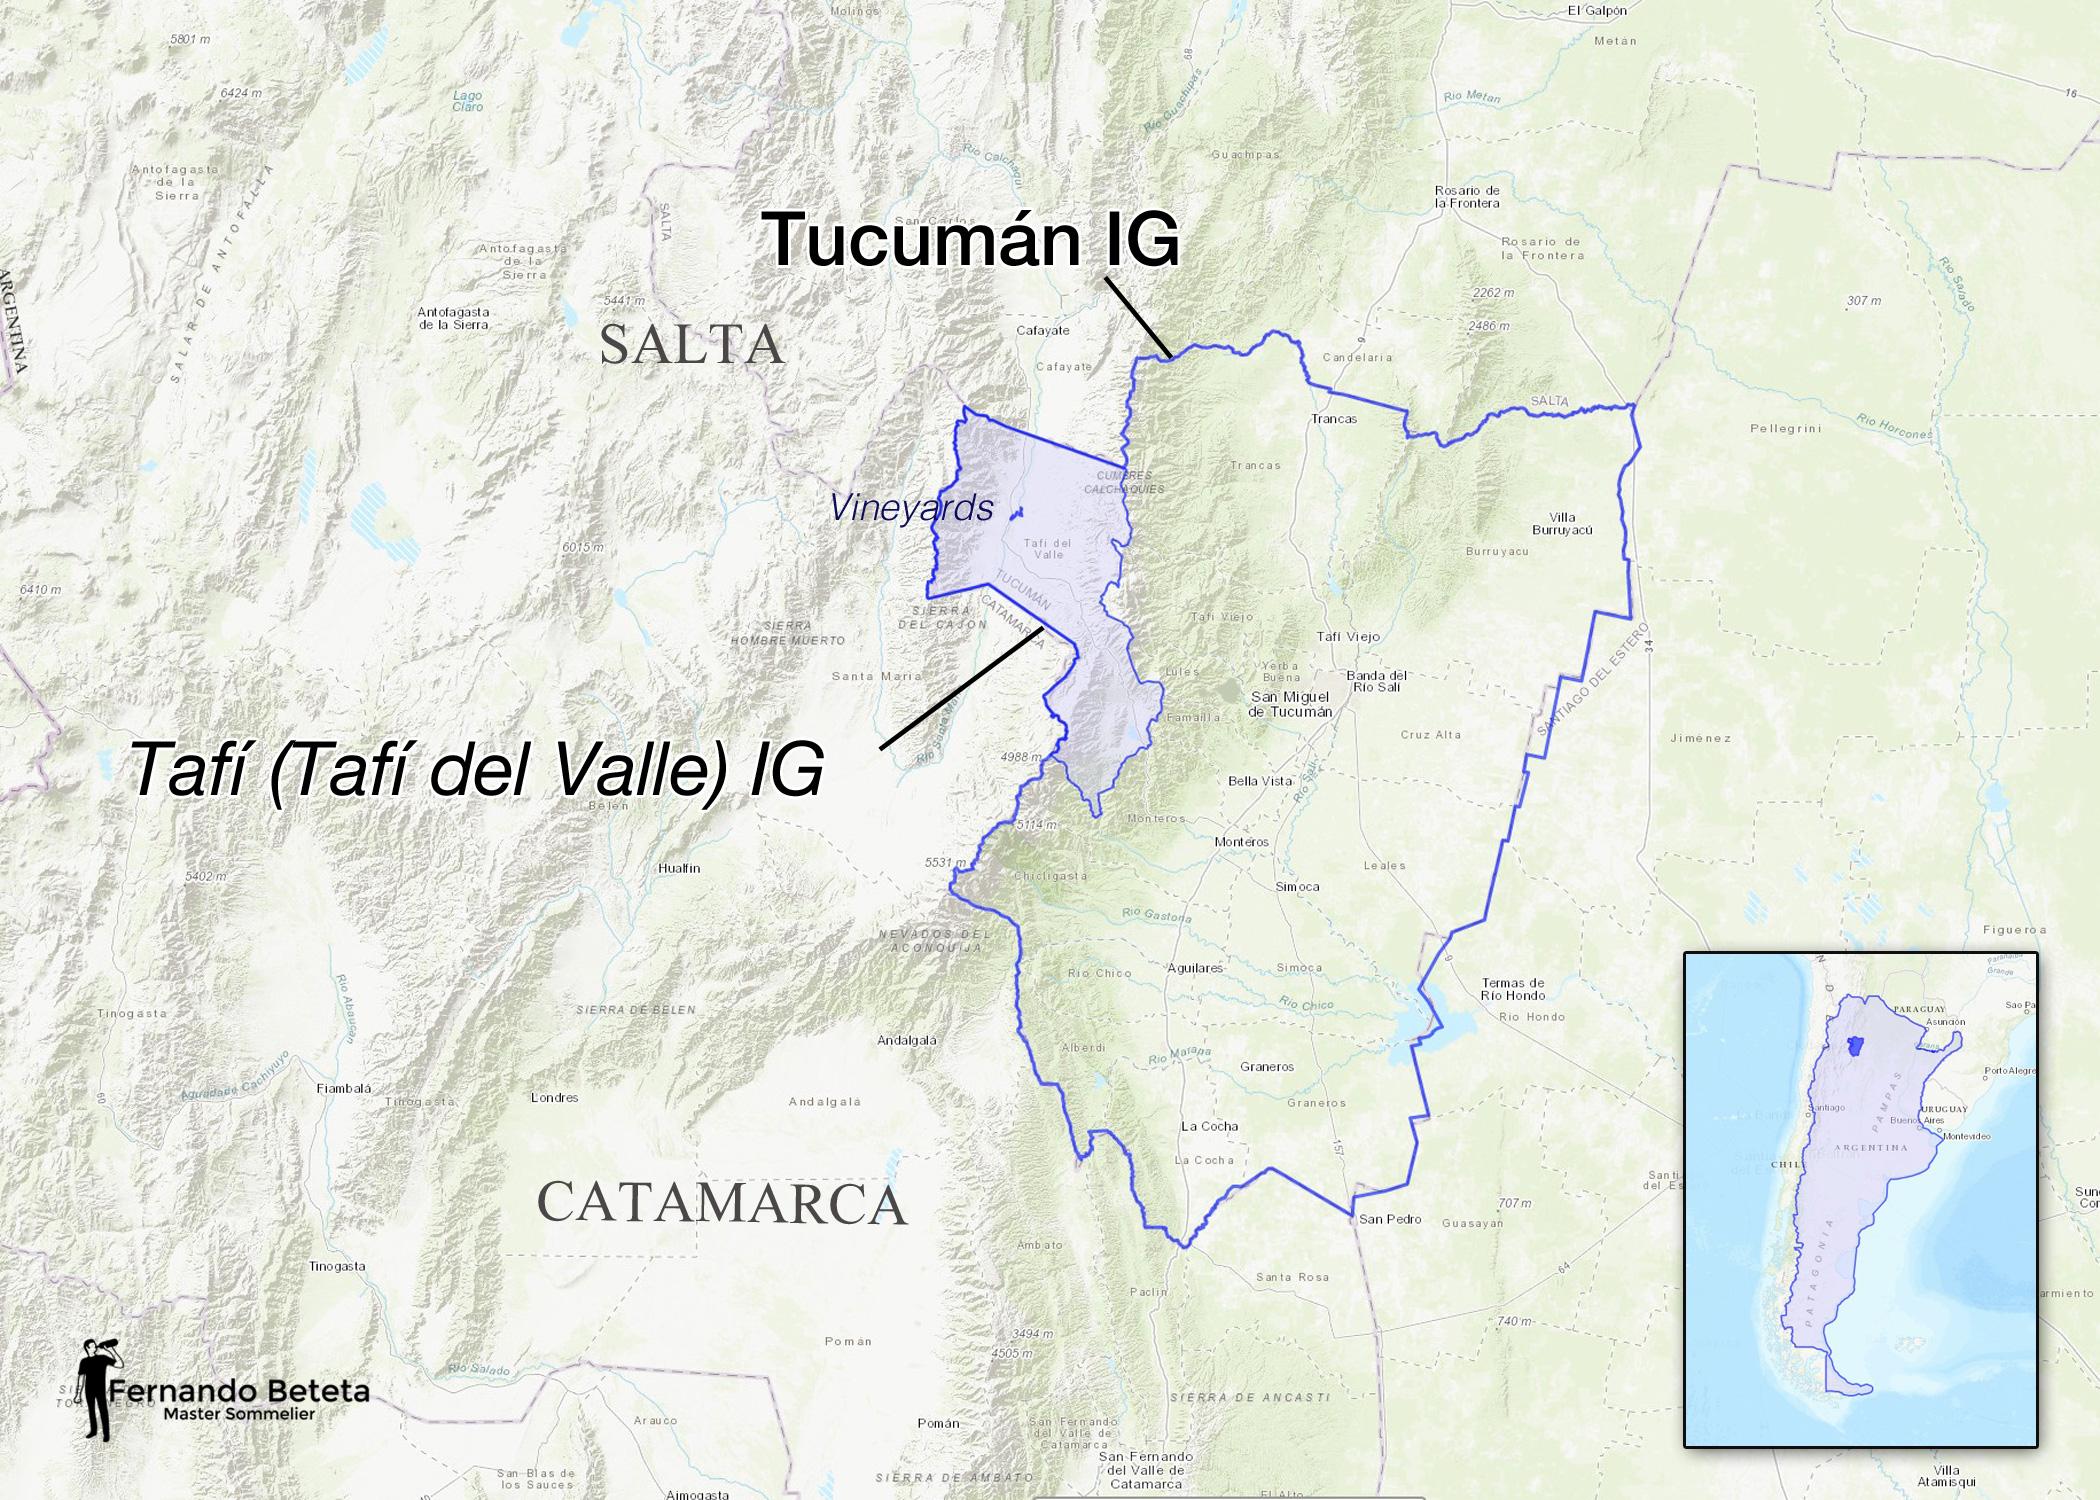 Argentina - Tucumán